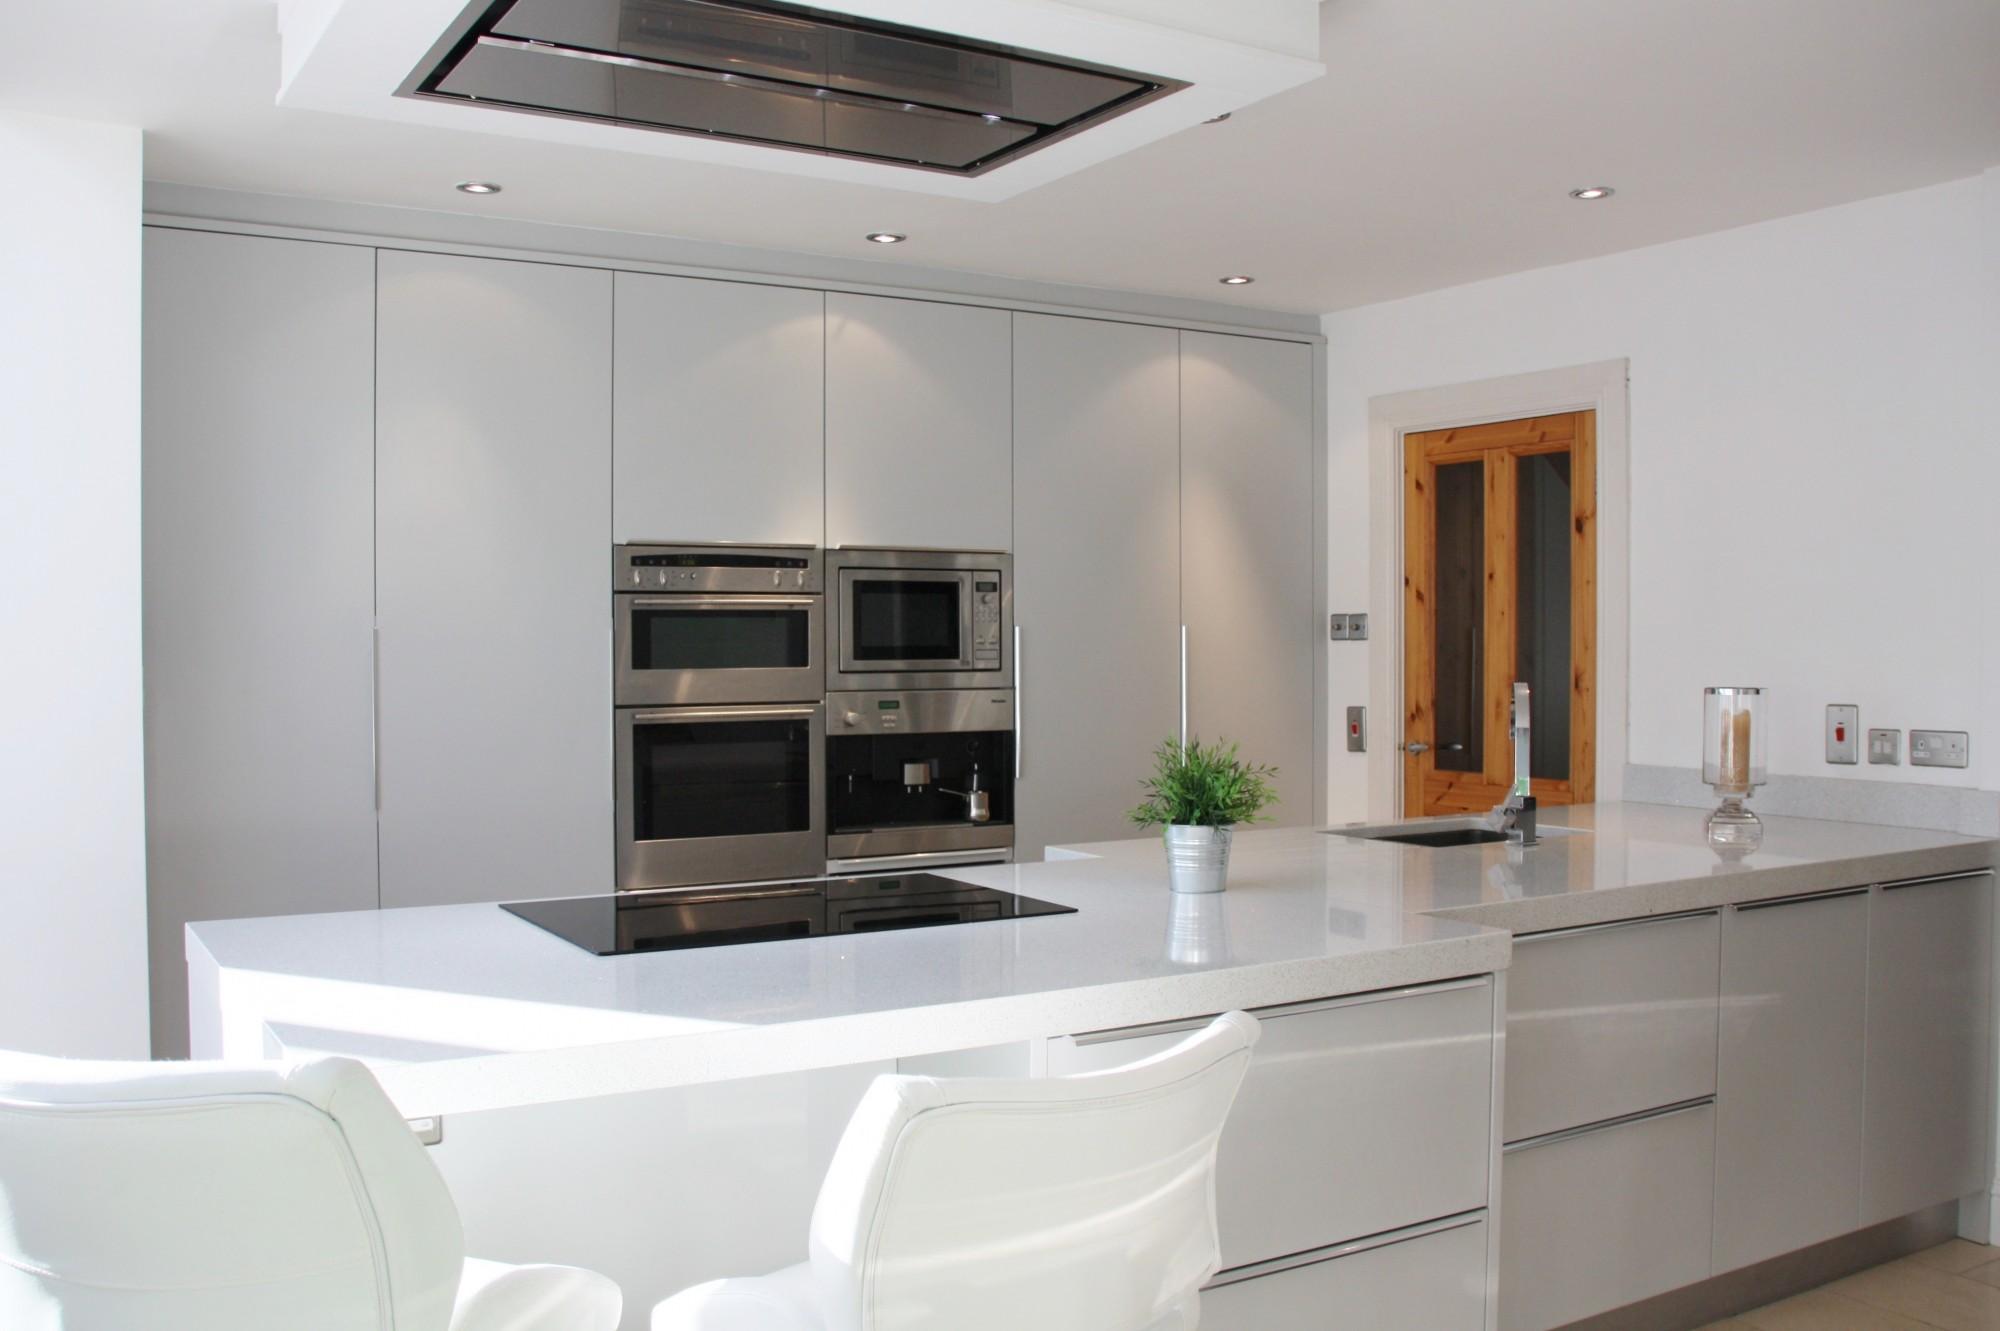 enigma design » contemporary flat panel kitchen design 1